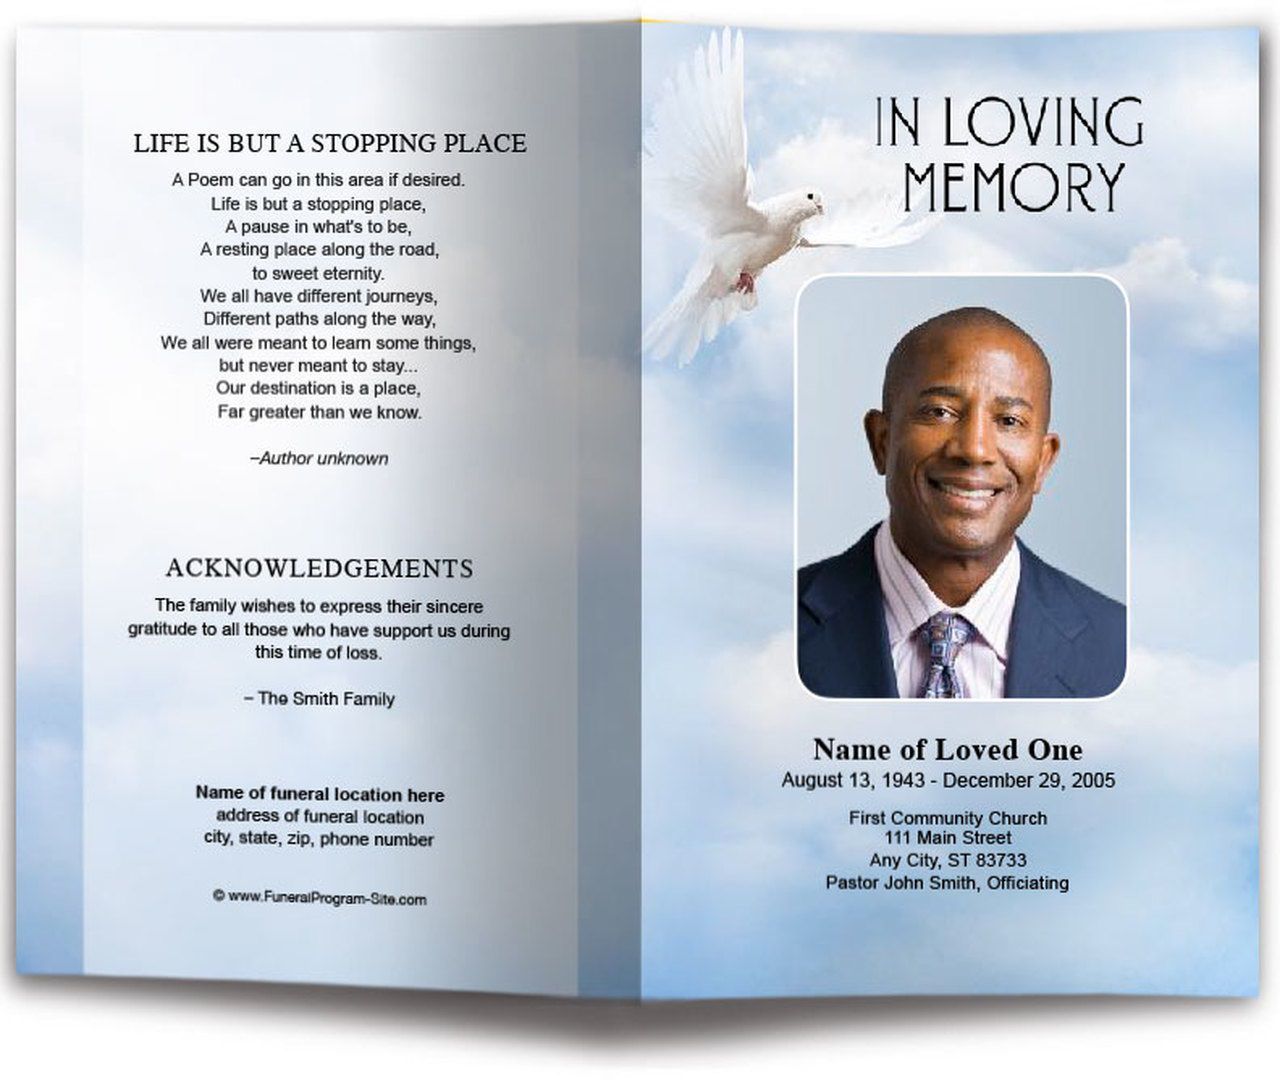 001 Incredible Free Funeral Program Template Photo  Word Catholic Editable PdfFull